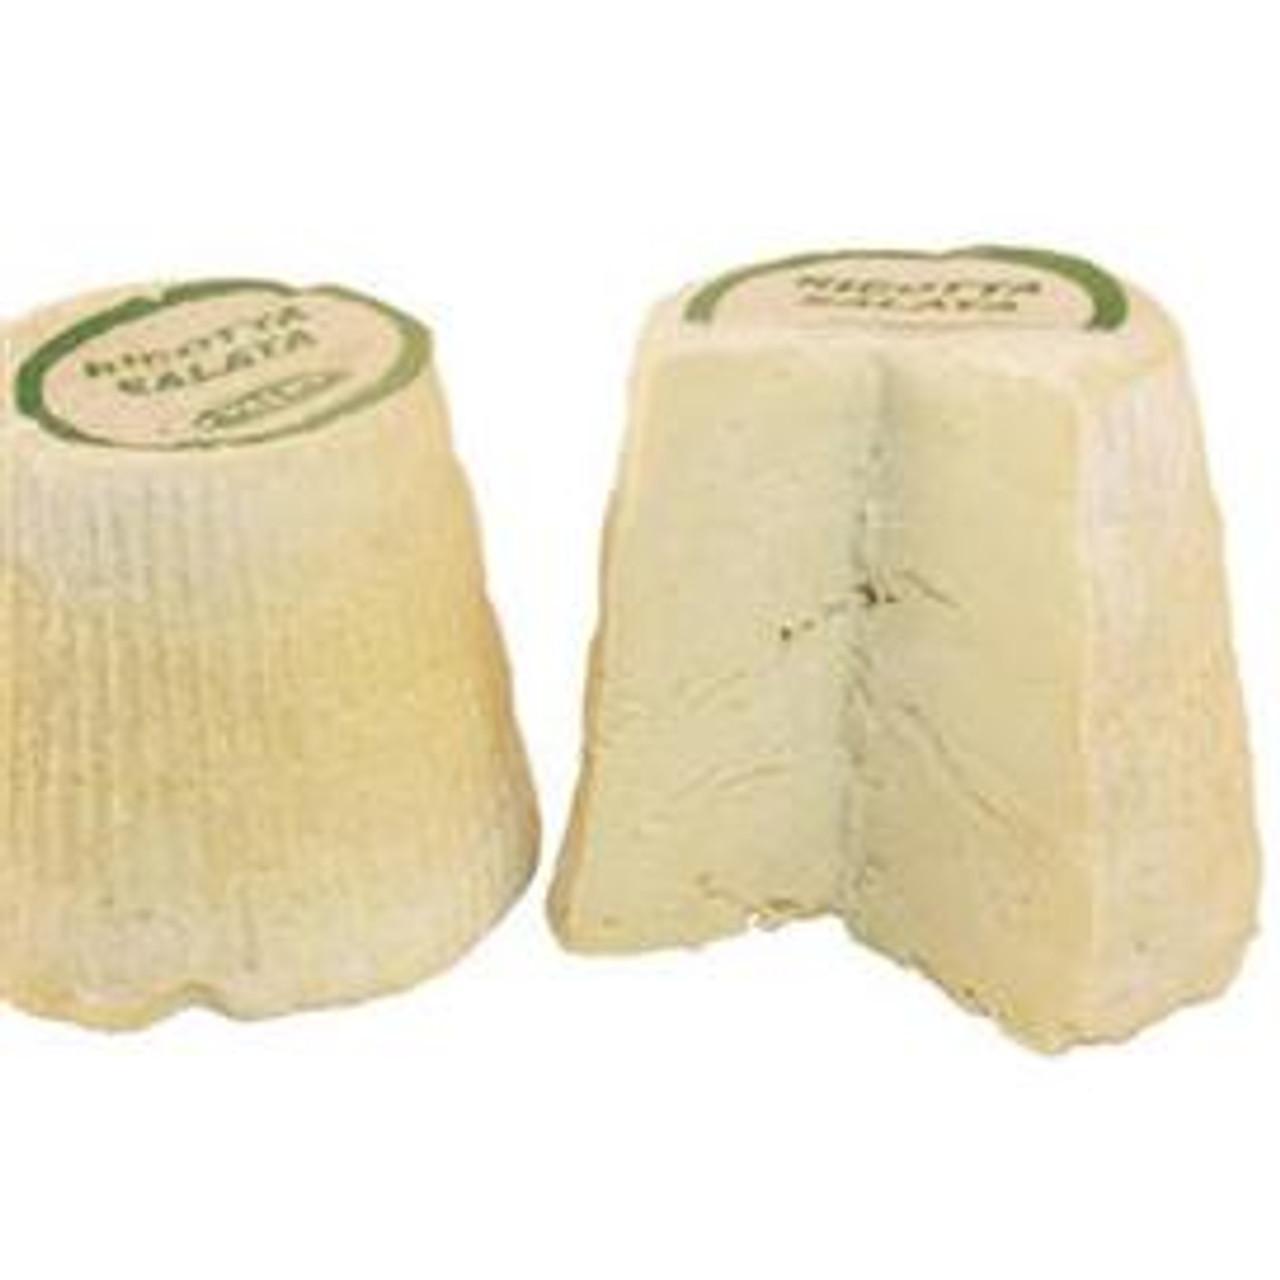 Imported Ricotta Salata Grating Cheese